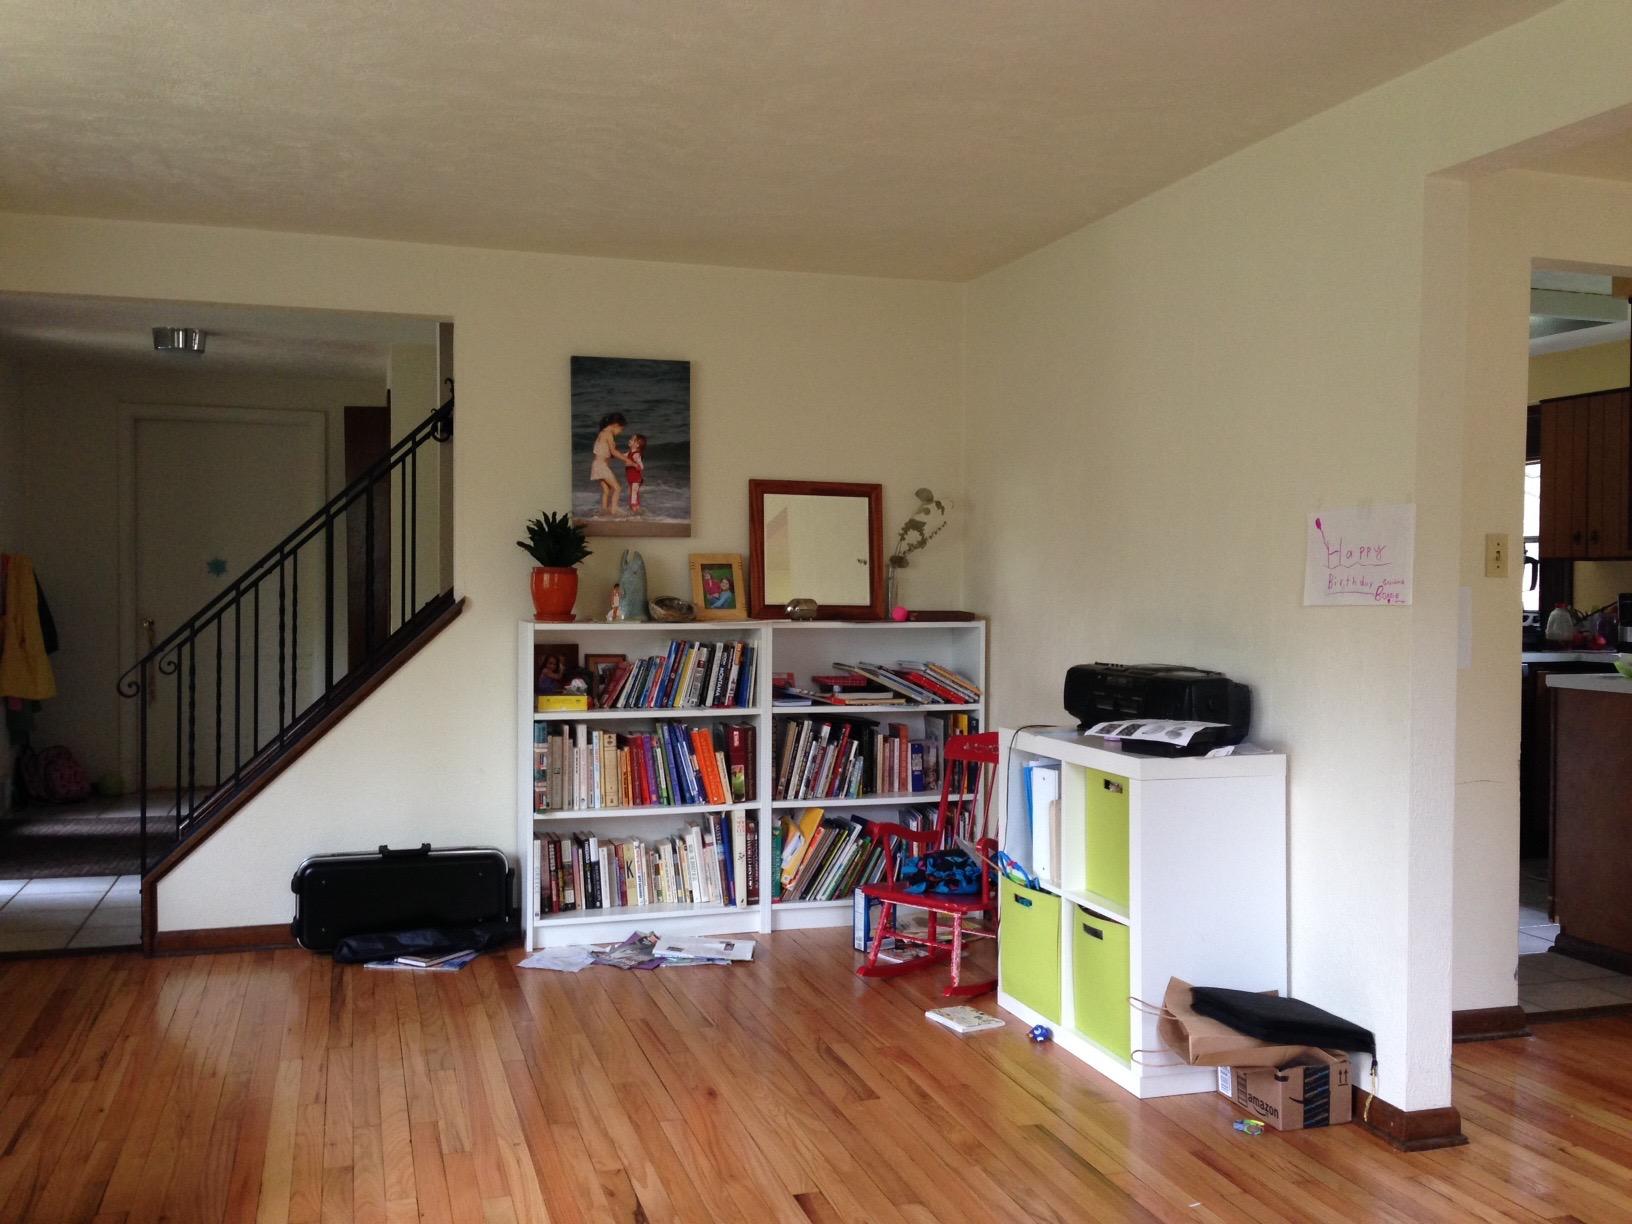 Daria's Living Room Before